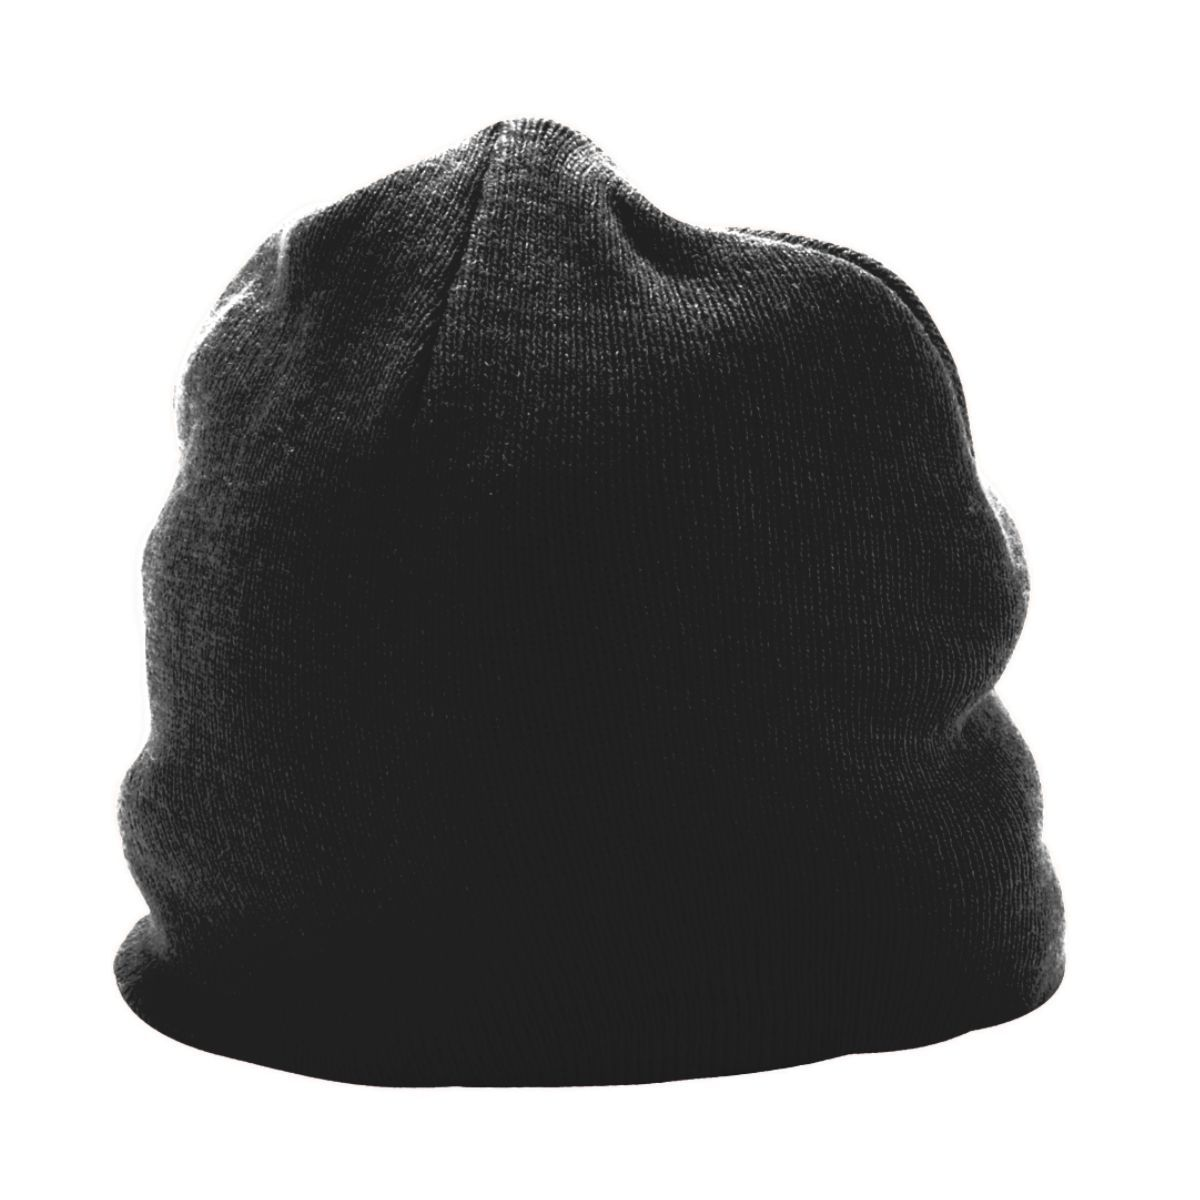 Knit Beanie - BLACK